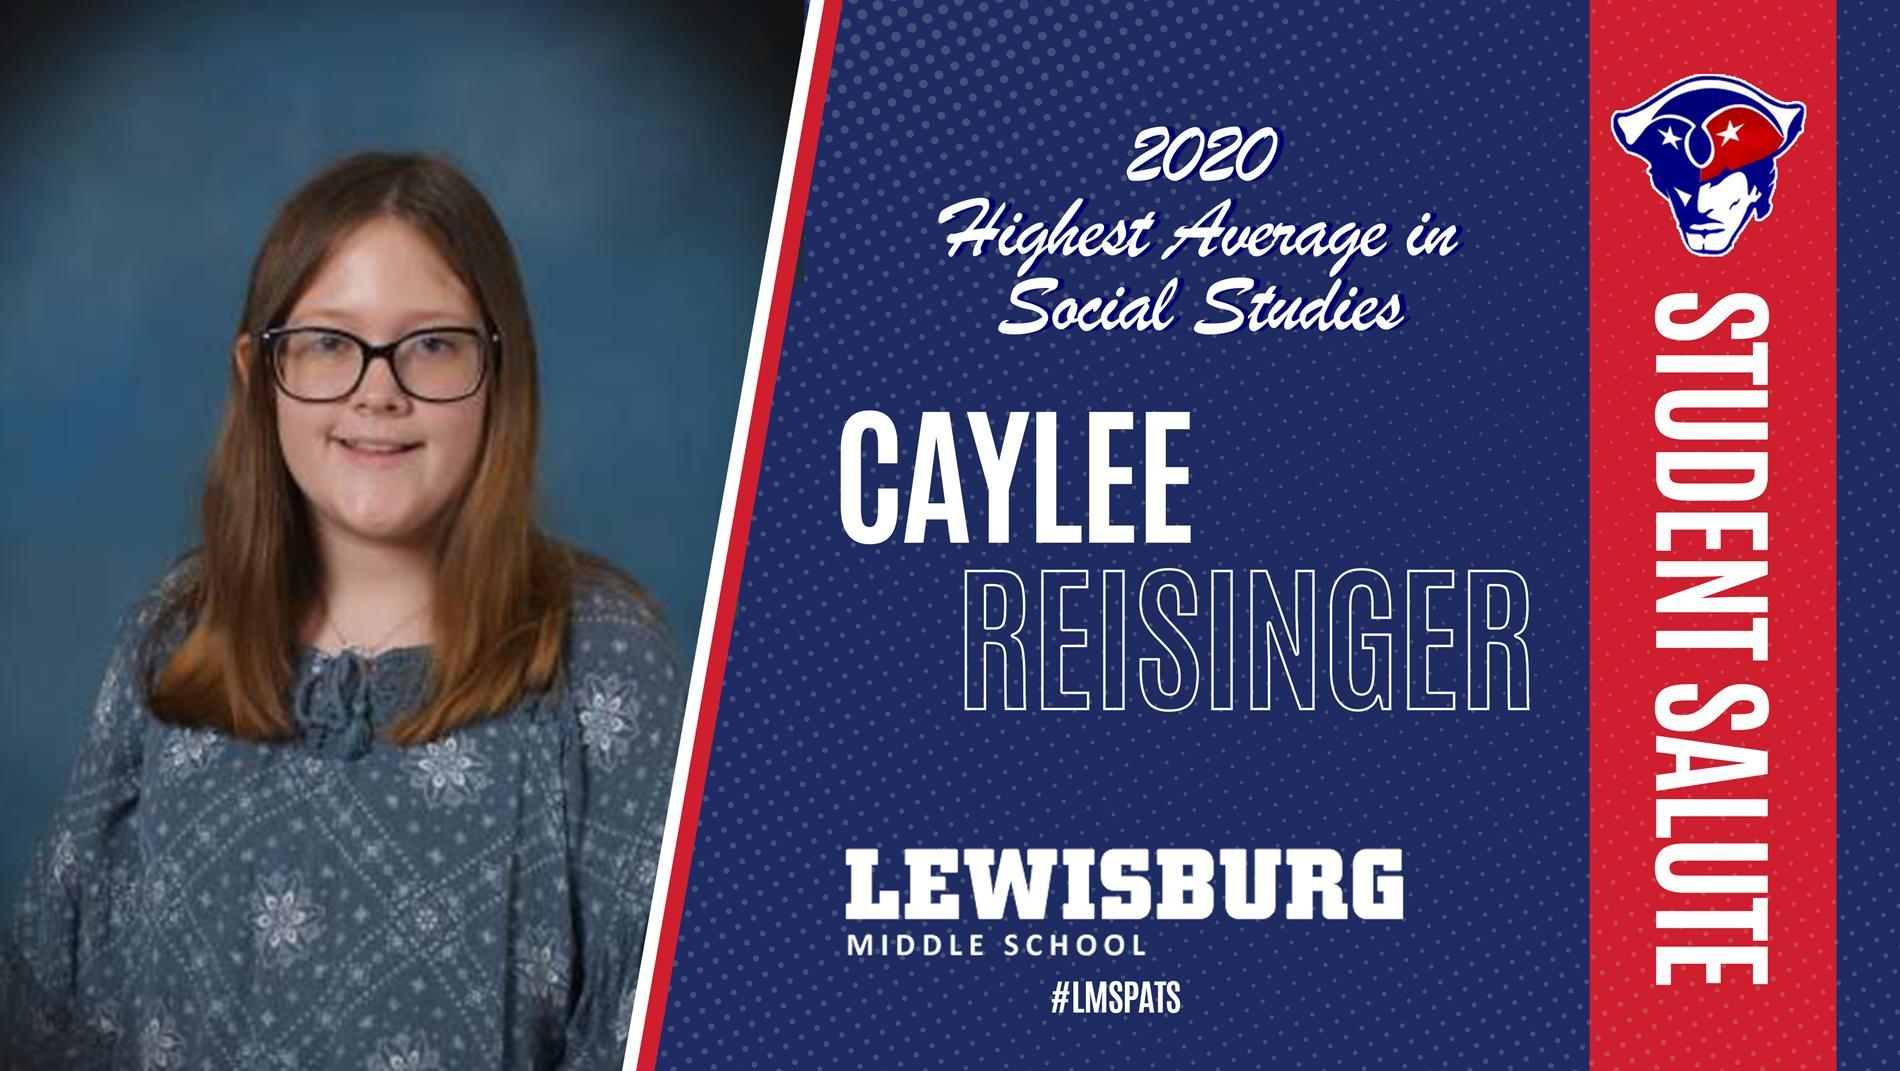 Congrats Caylee!